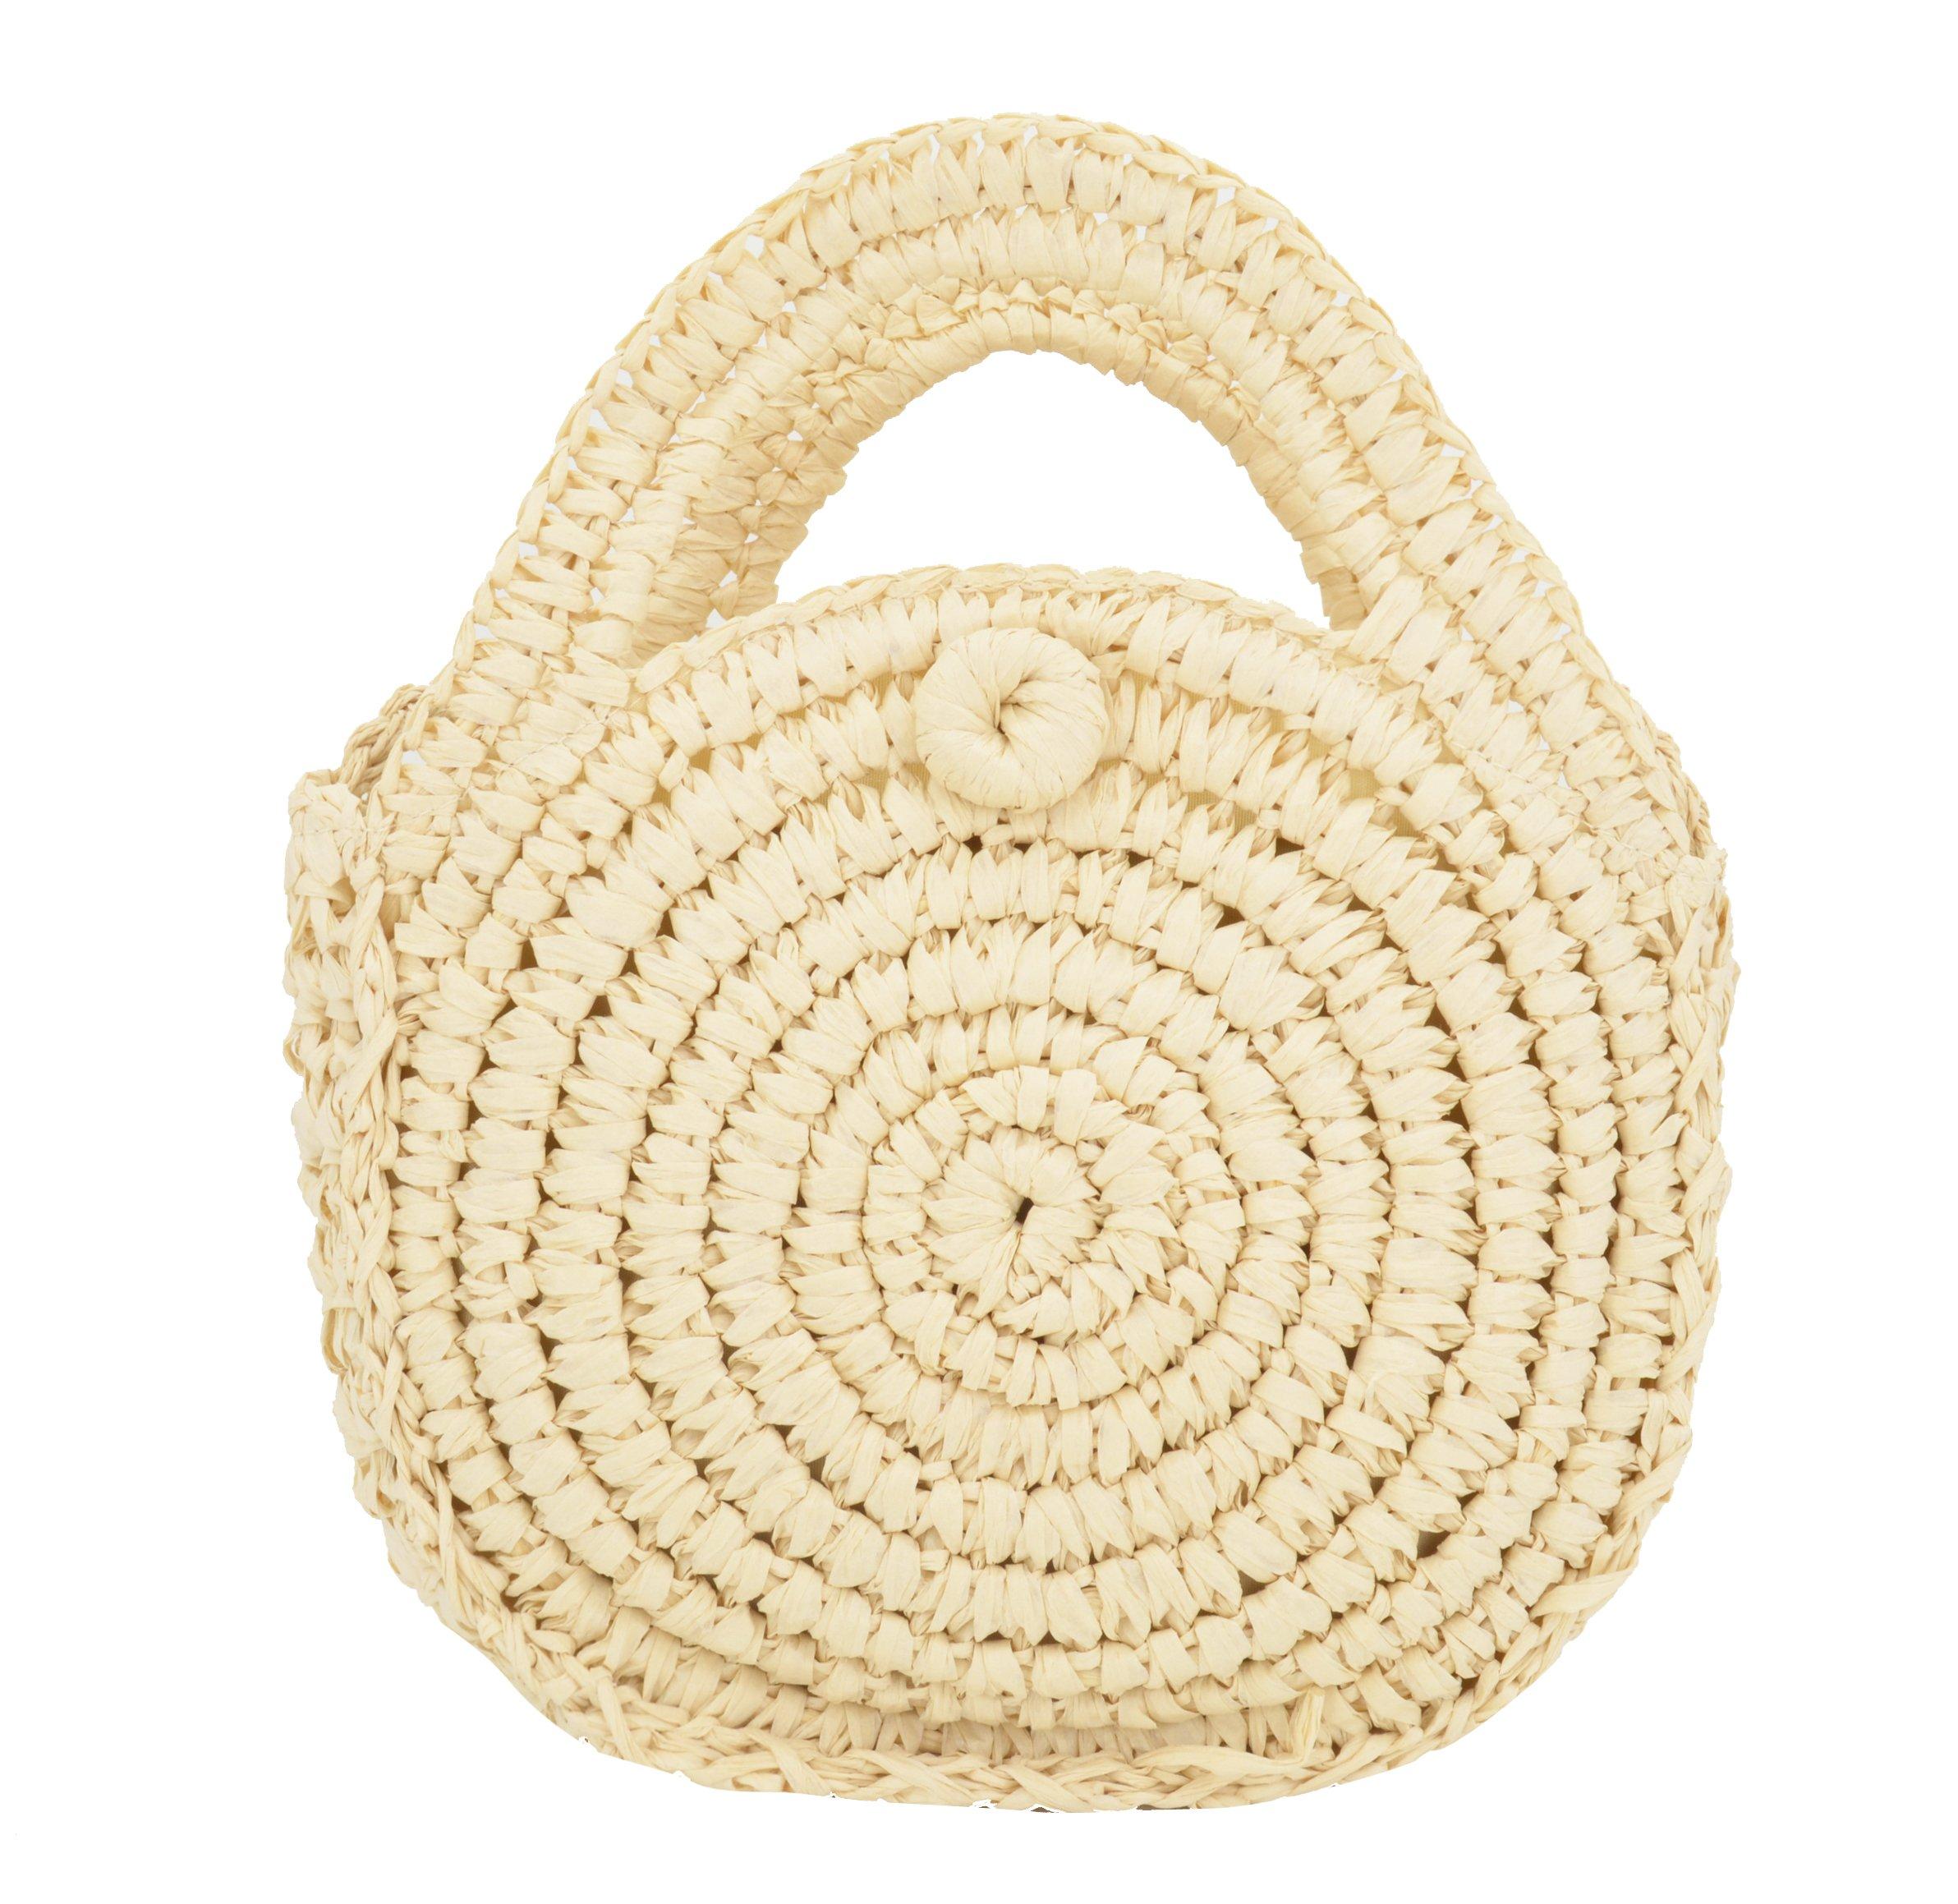 OVOV Women's Straw Crossbody Bag Round Shoulder Bag Purse and Handbags for Summer Beach Sea (Beige)